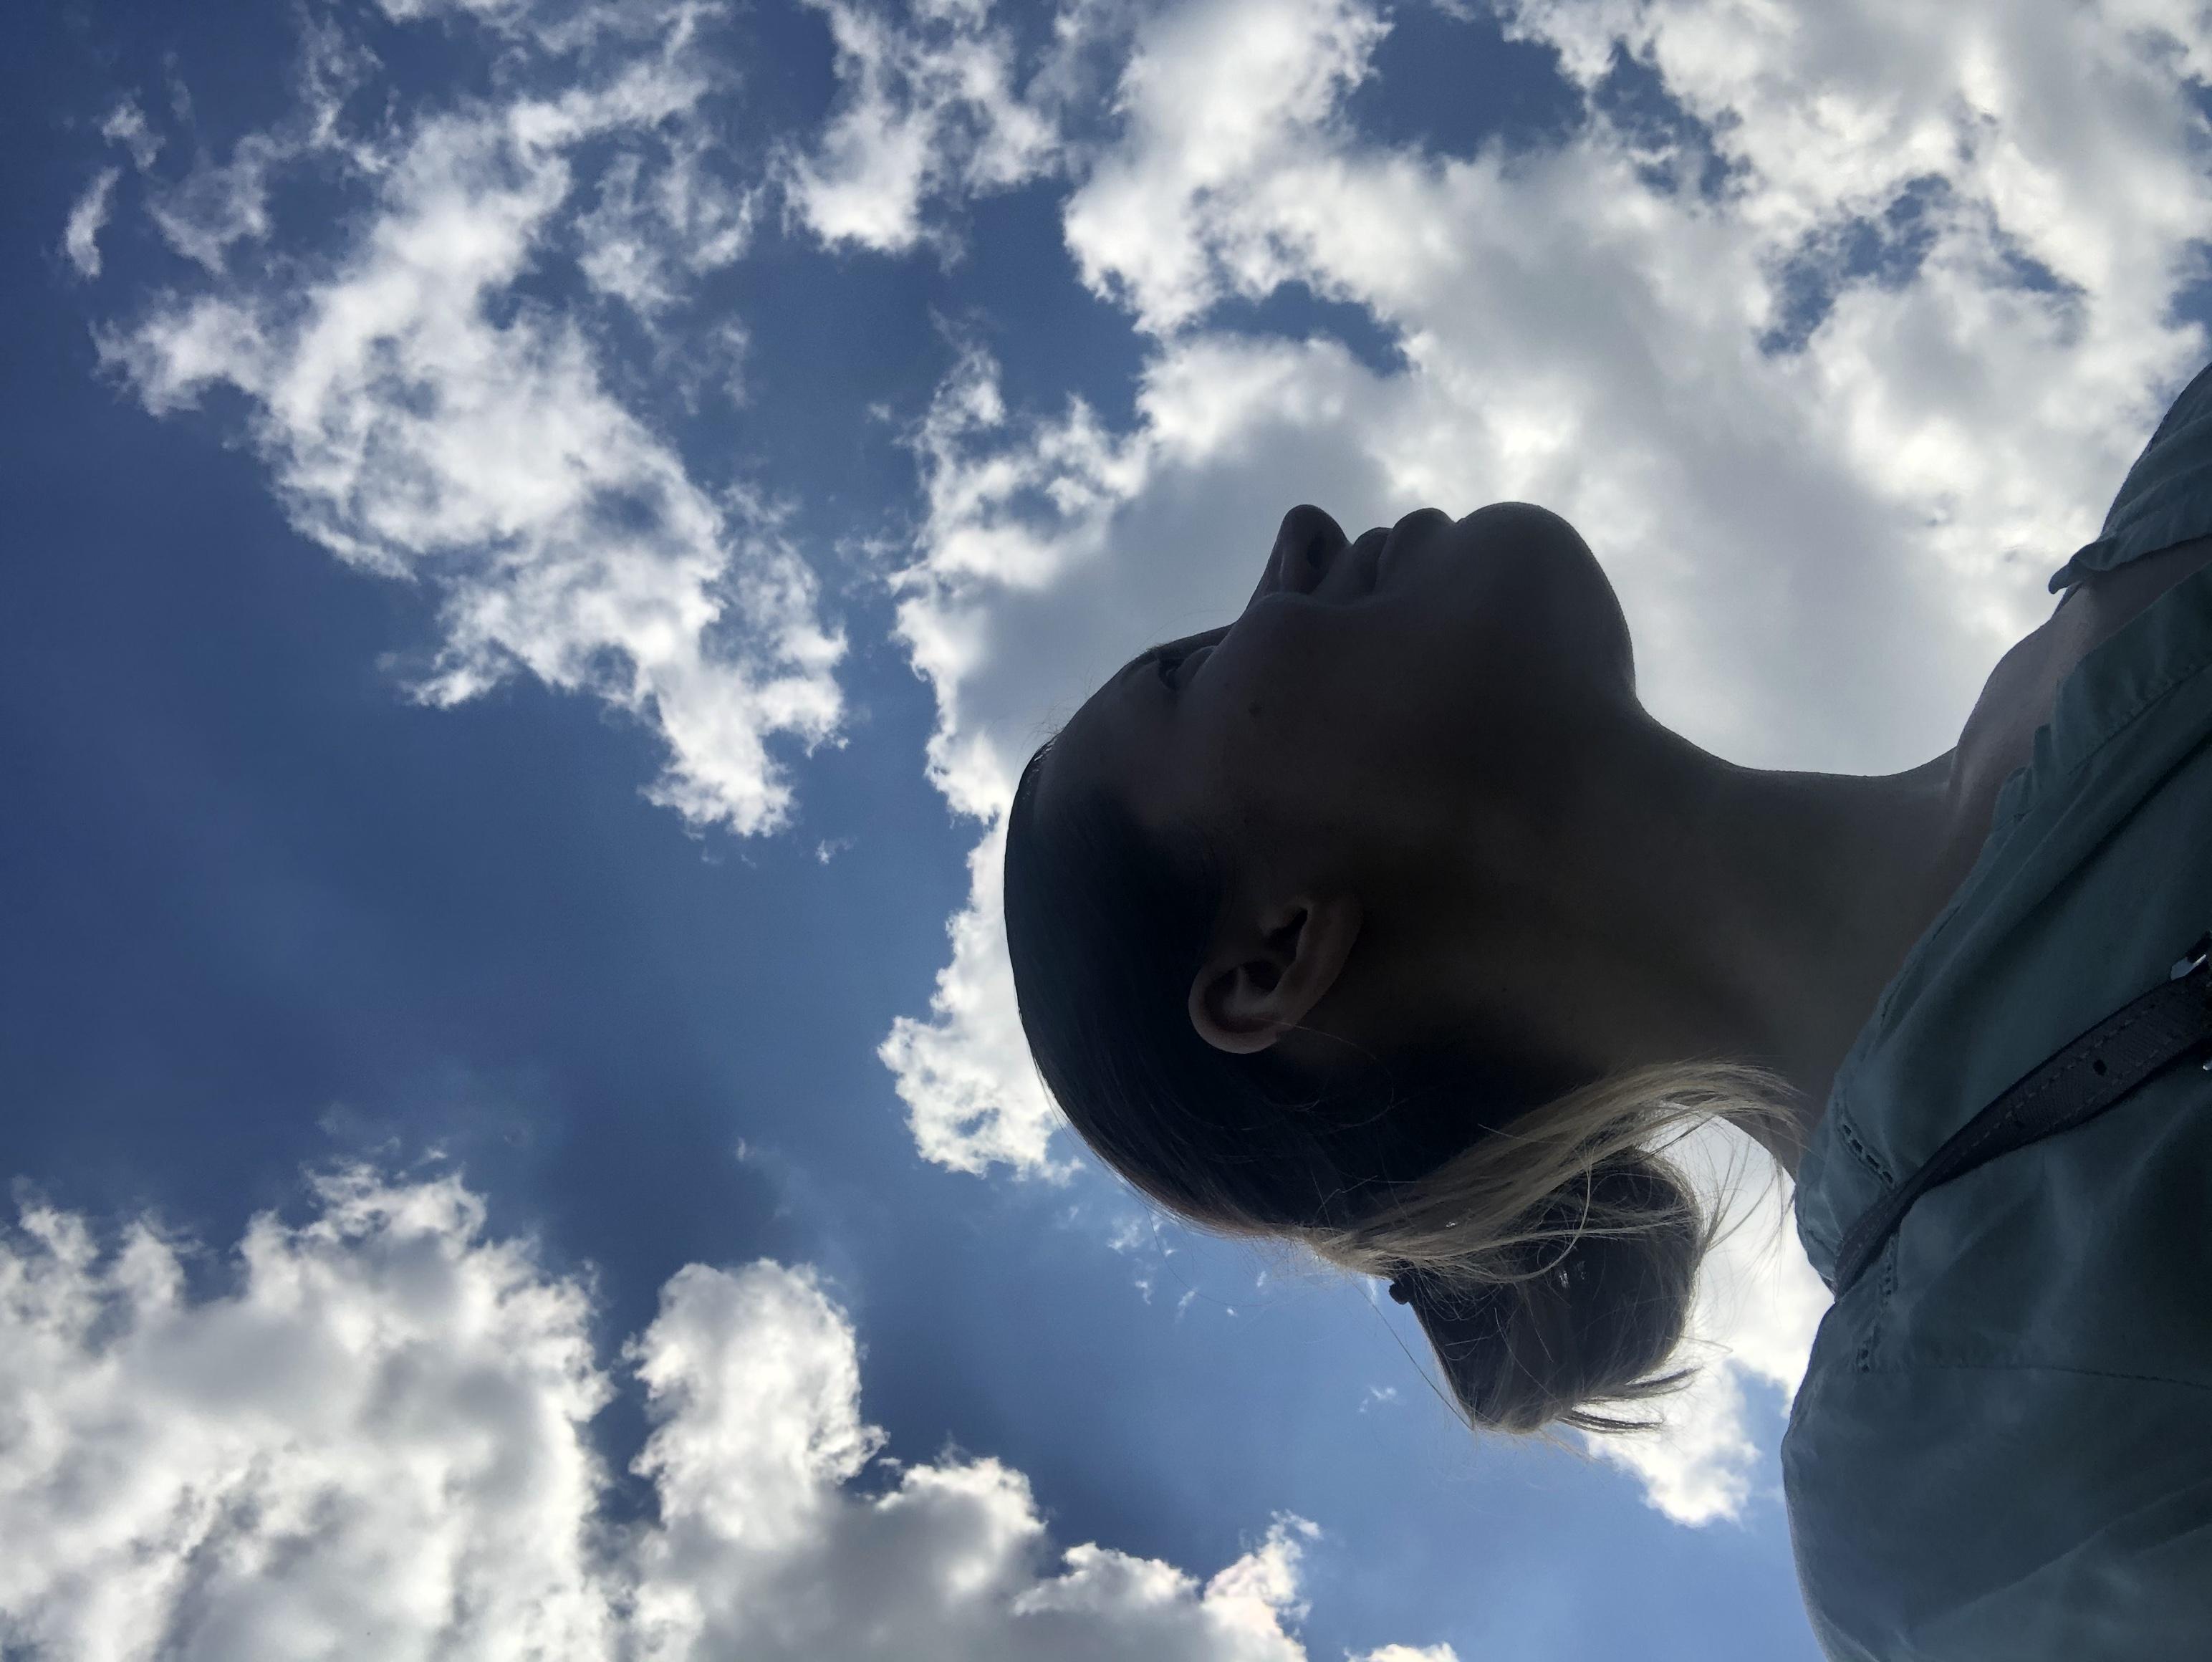 О воспитанности, человечности, истощении, обесценивании и границах - психолог Диана Сушко